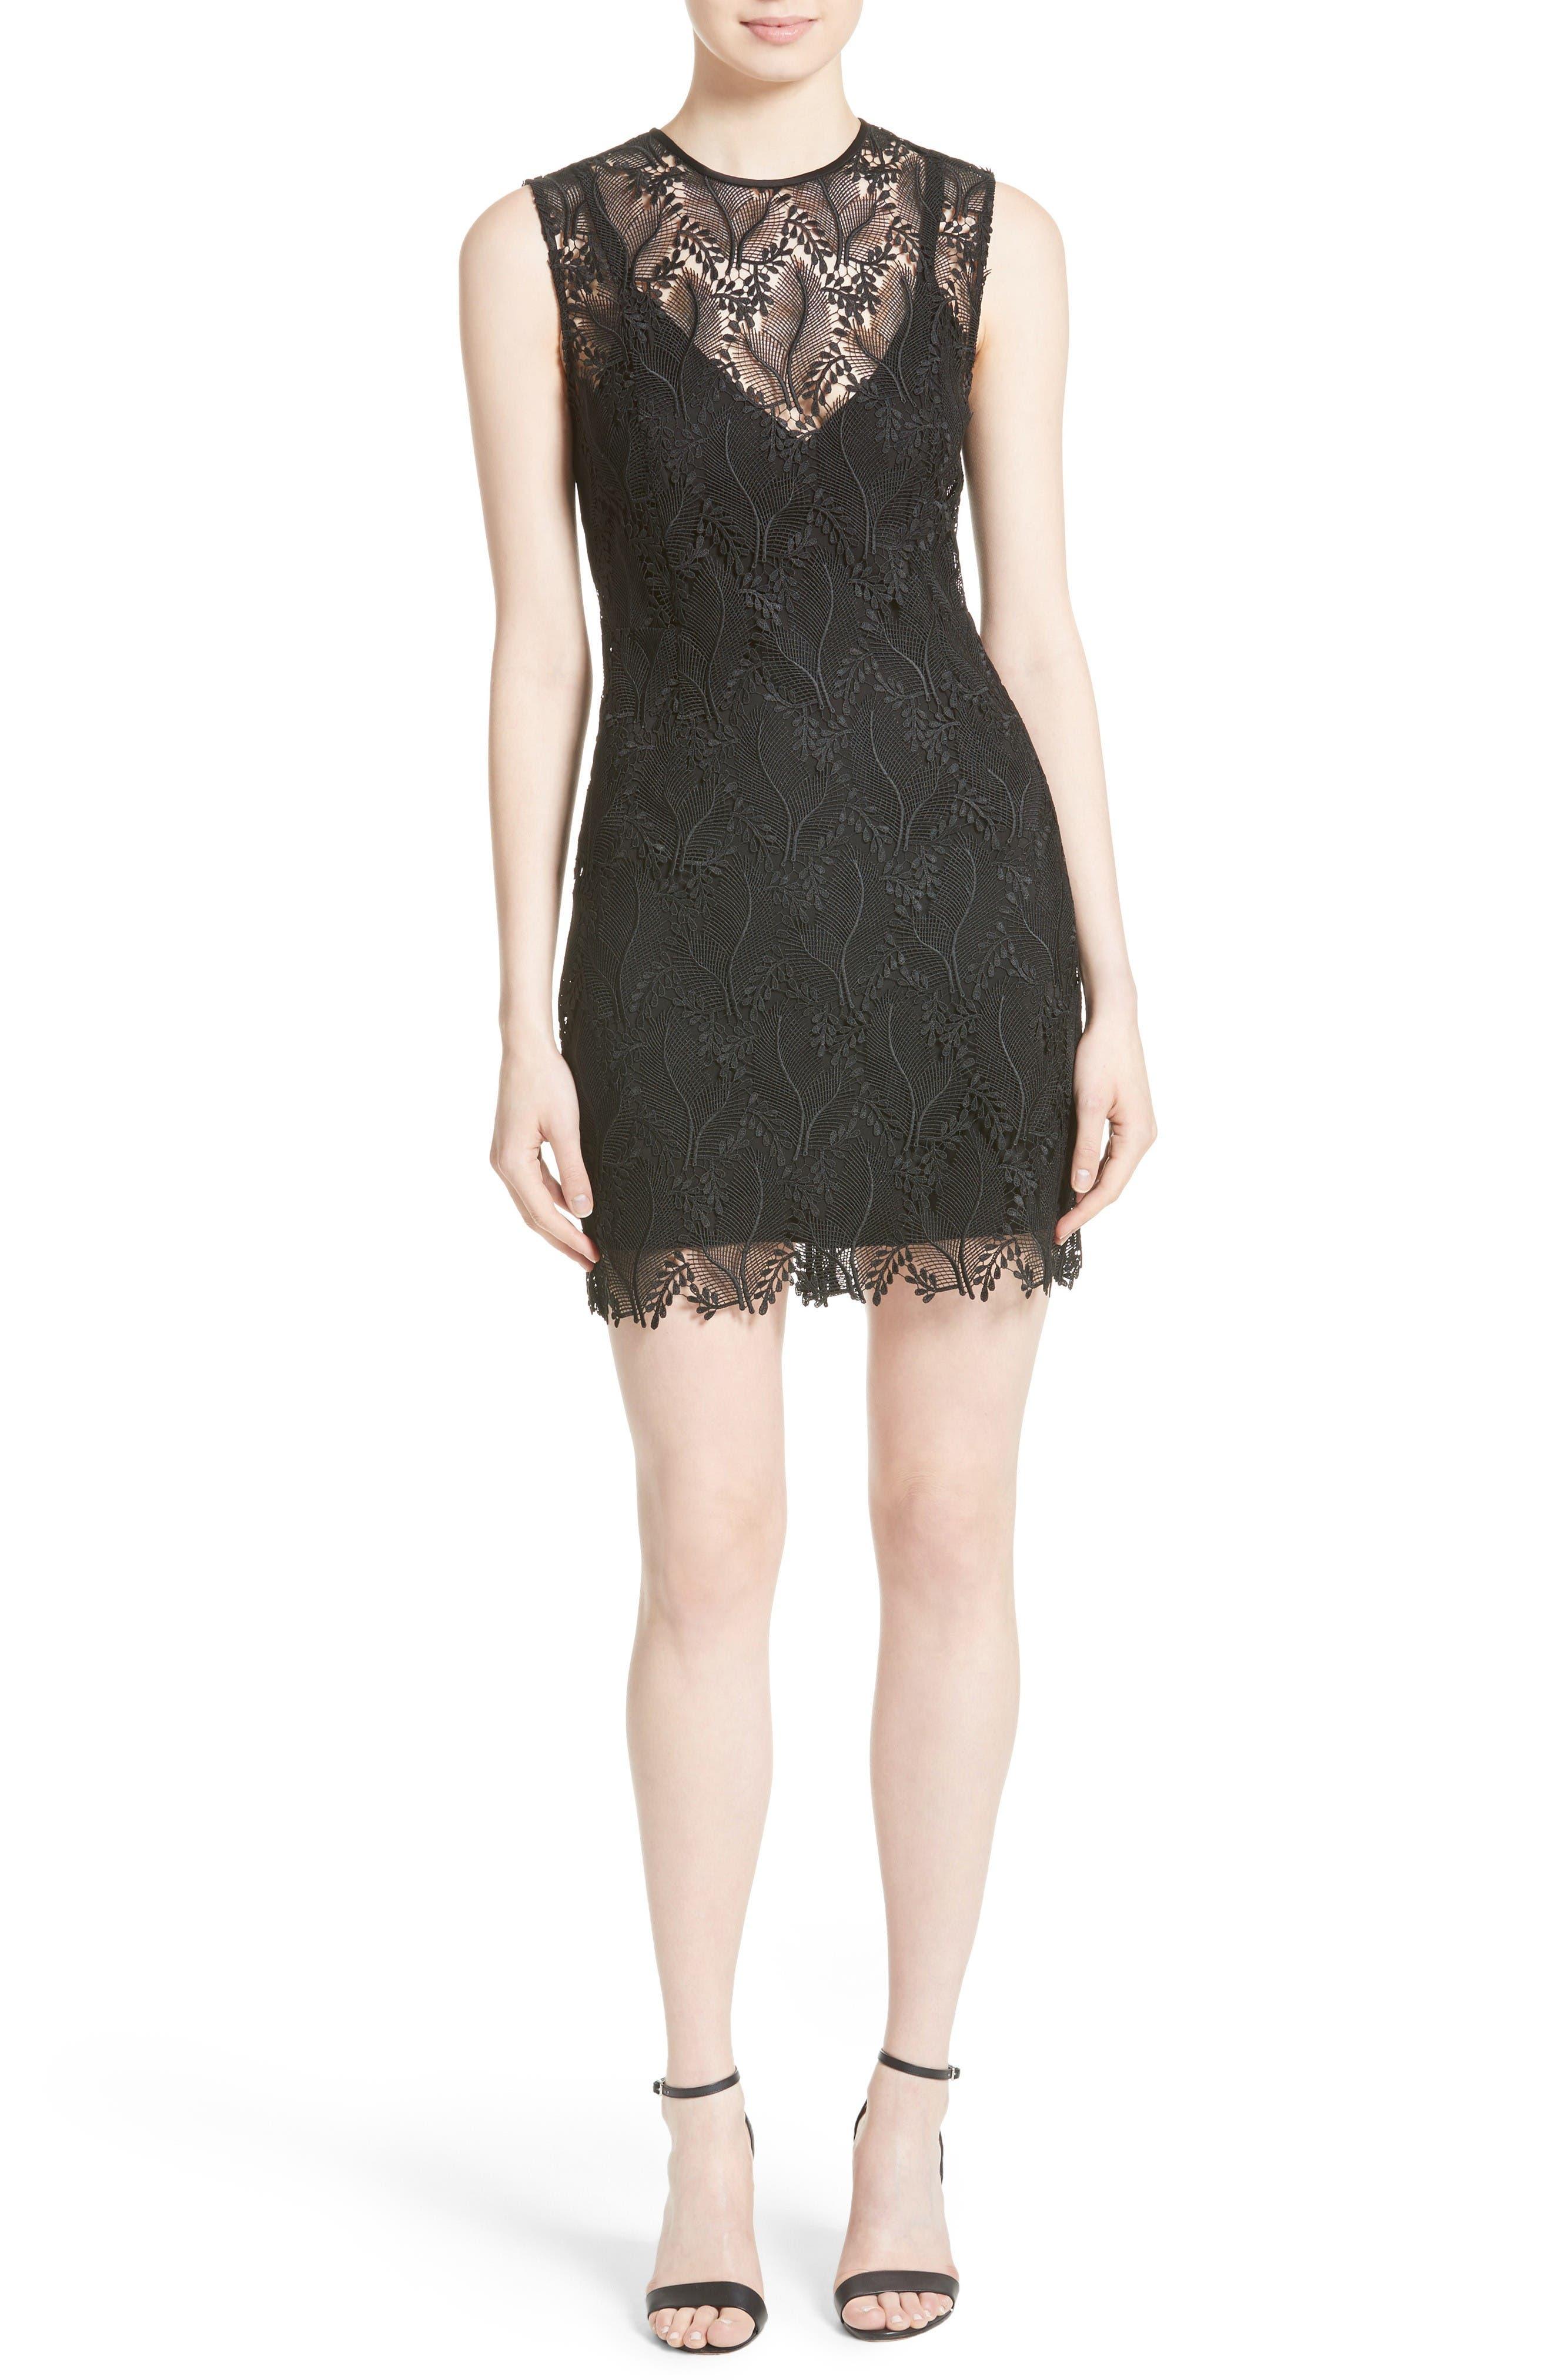 Lace Overlay Mindress,                         Main,                         color, Black/ Black